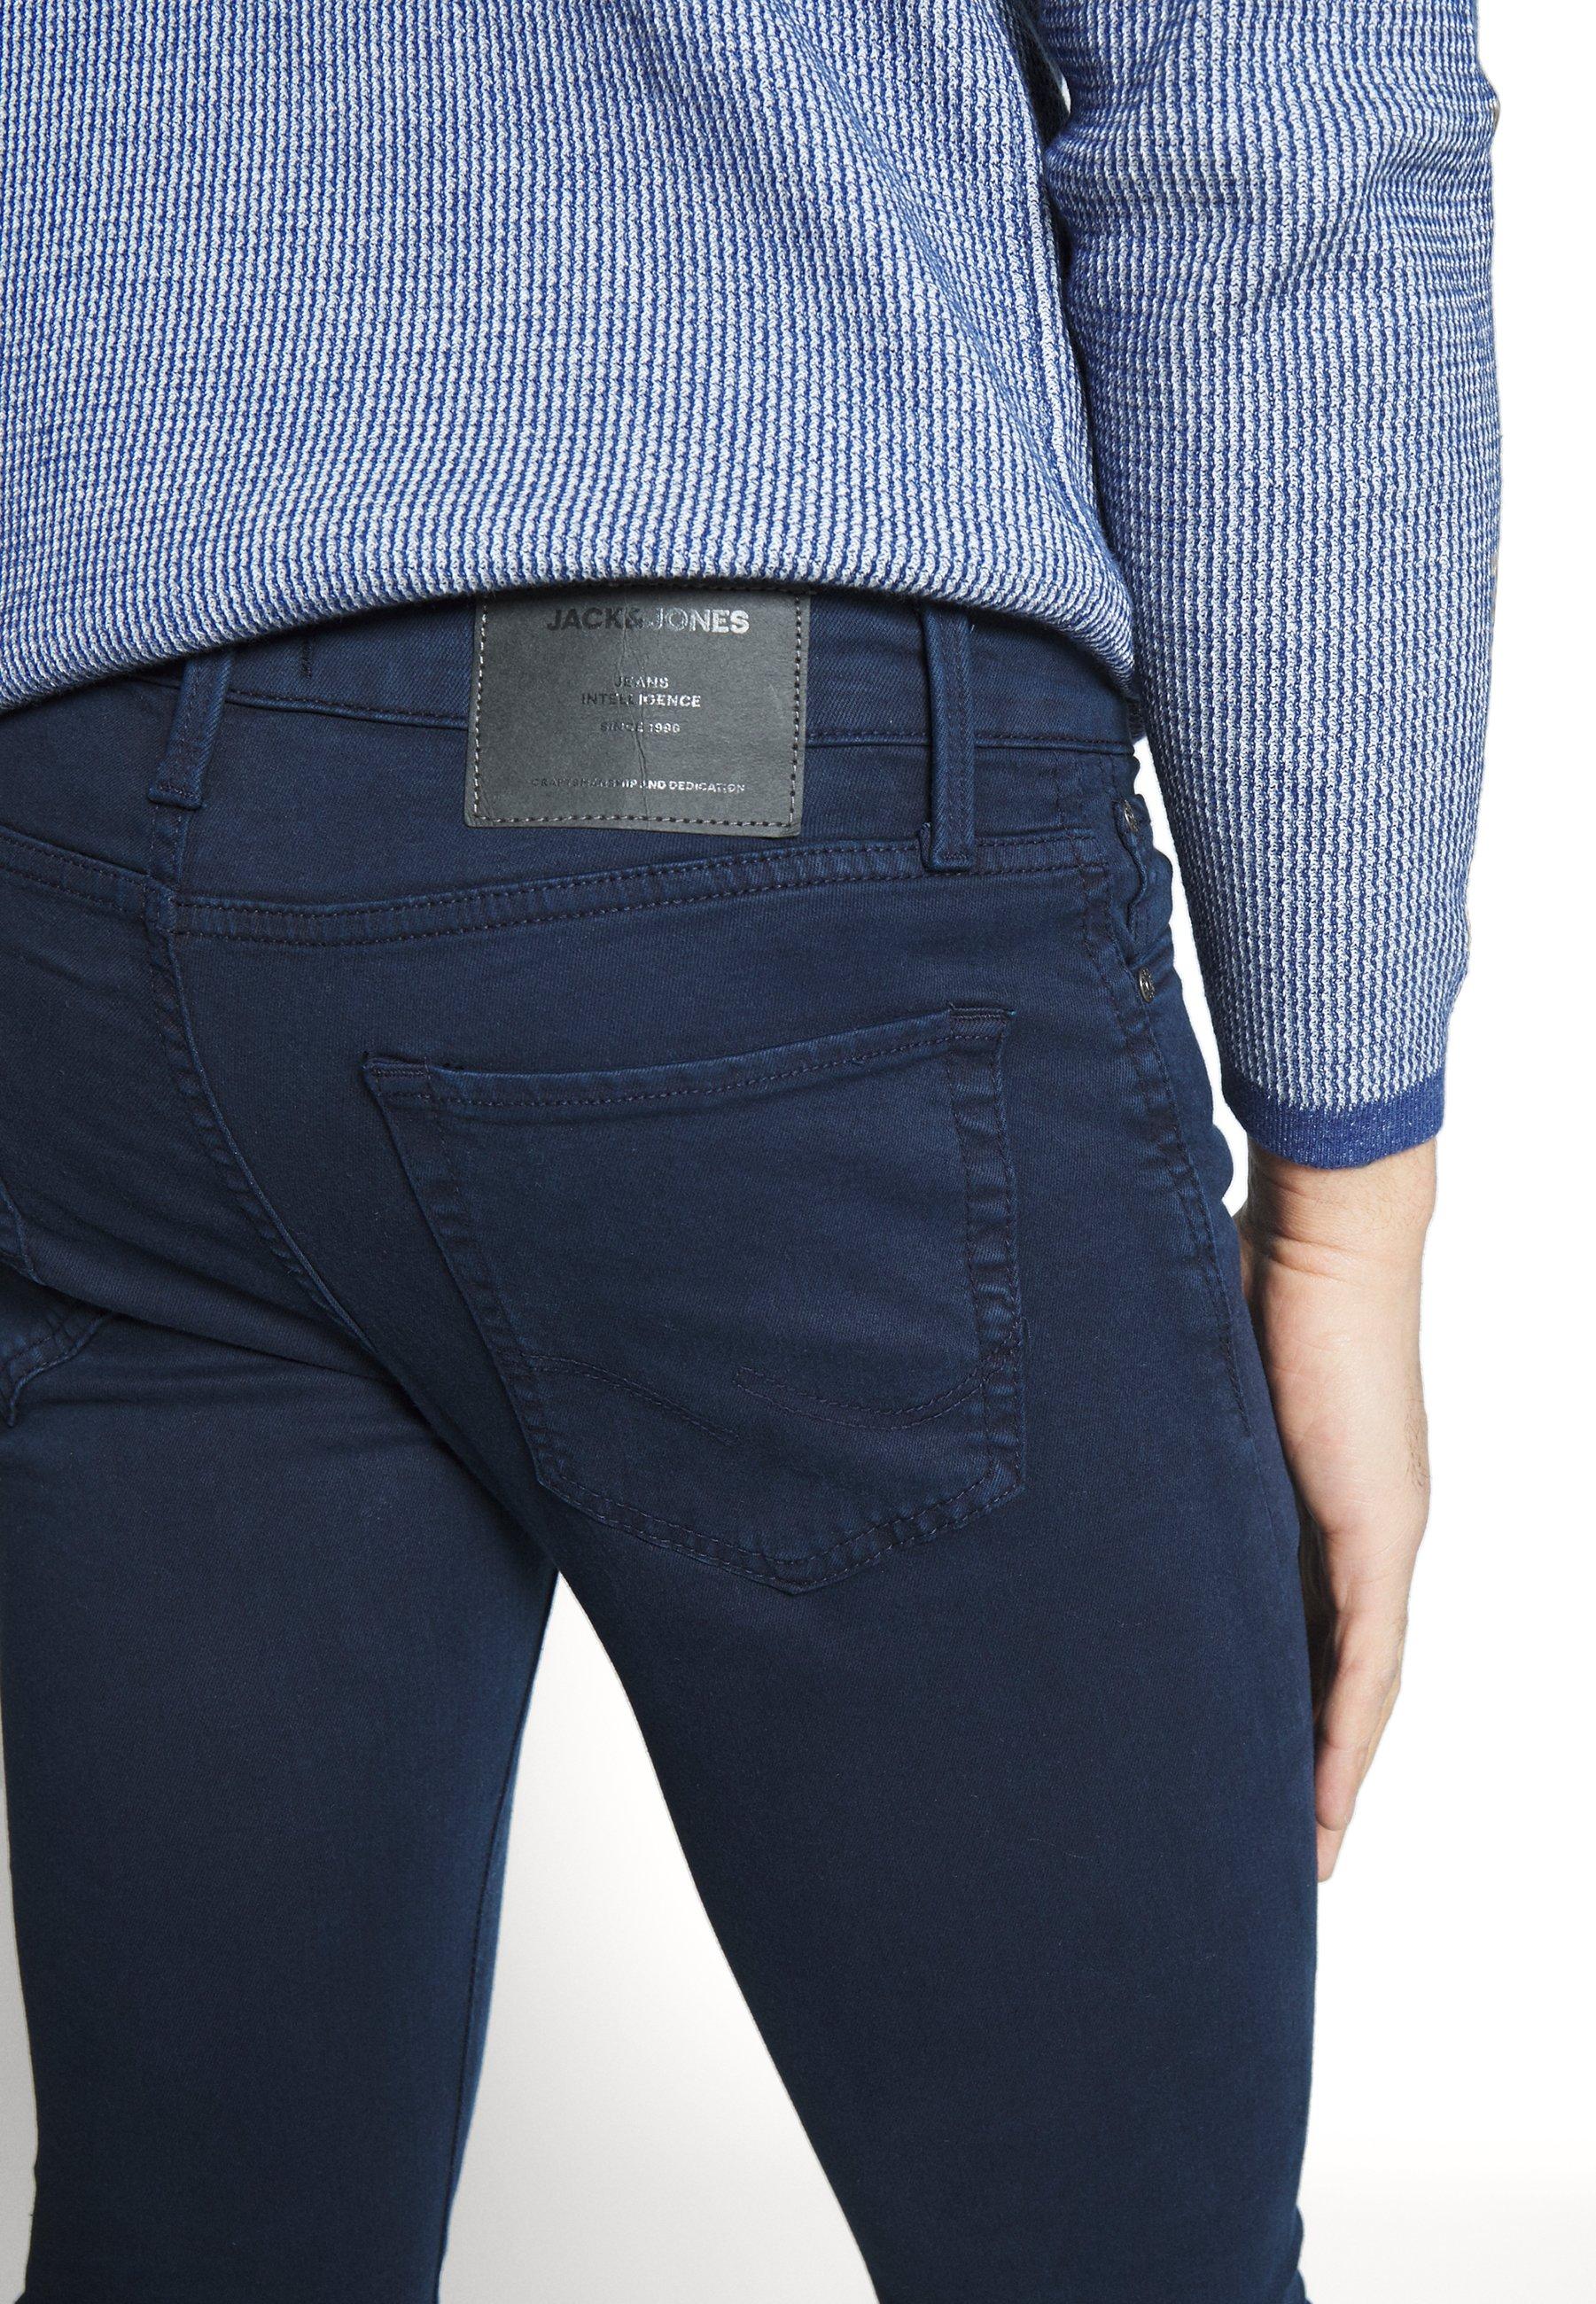 Jack & Jones Jiglenn Jjicon Ama - Jeans Slim Fit Navy Blazer